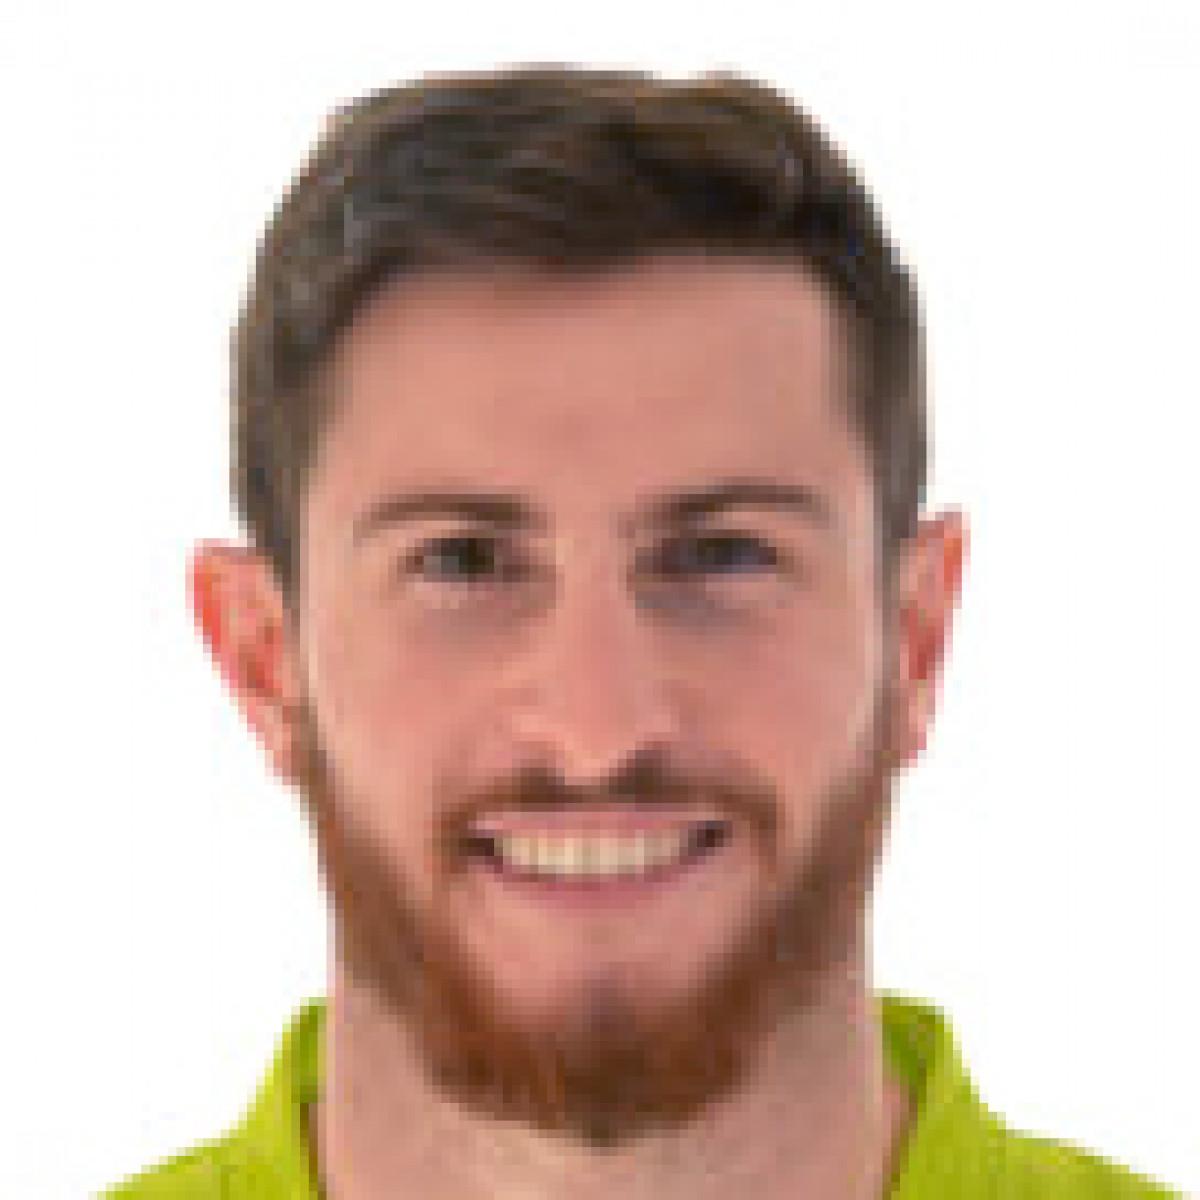 Daniel Monteroso